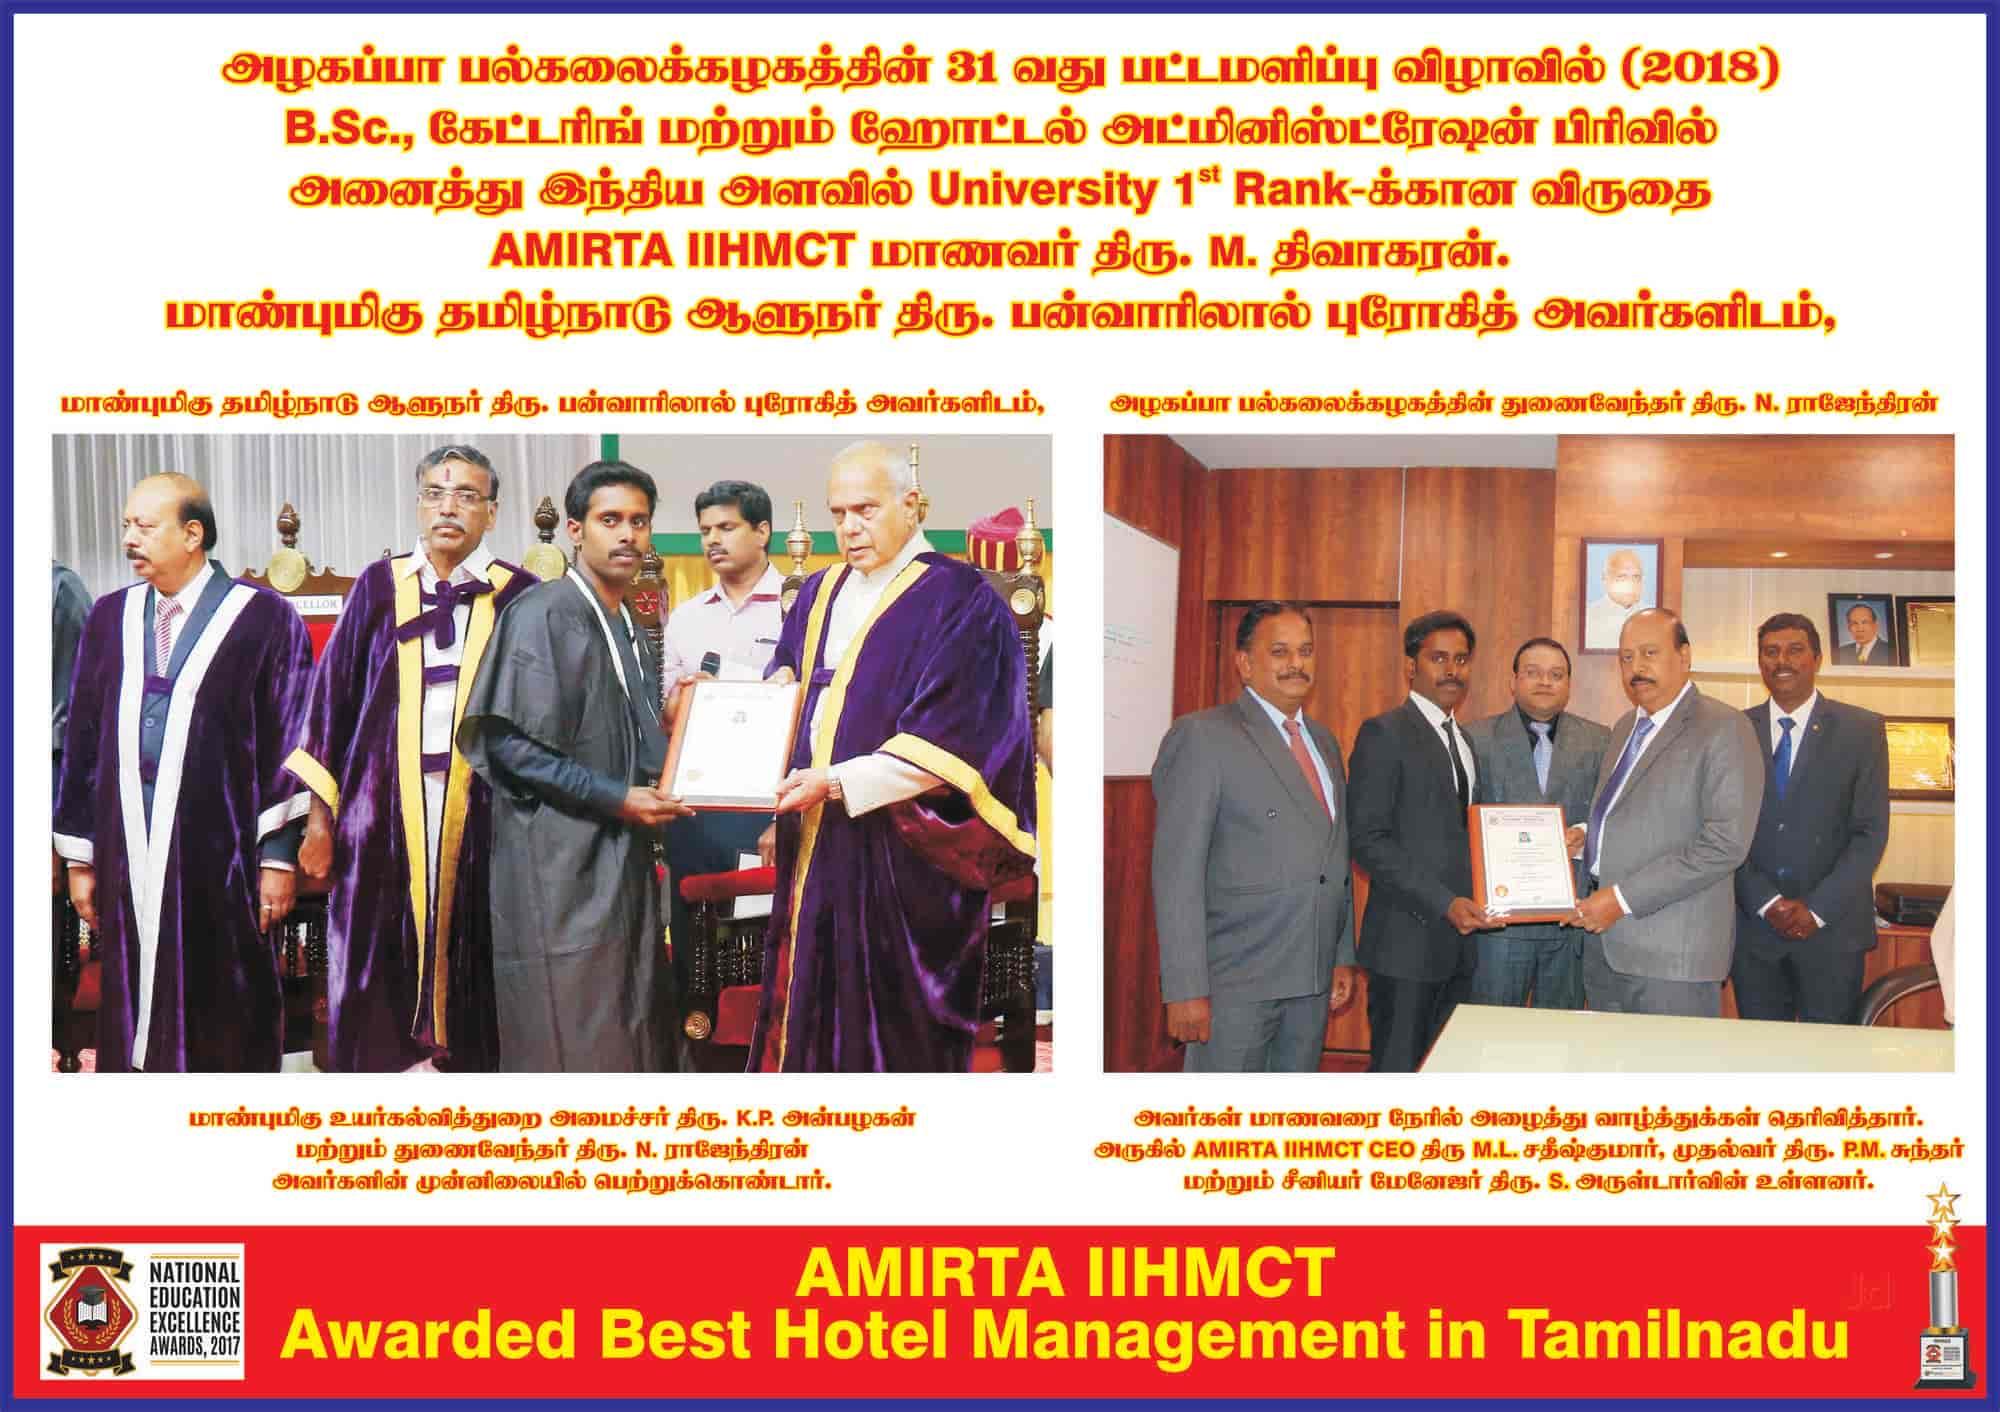 Amirta International Institute Of Hotel Management Photos, Chathiram